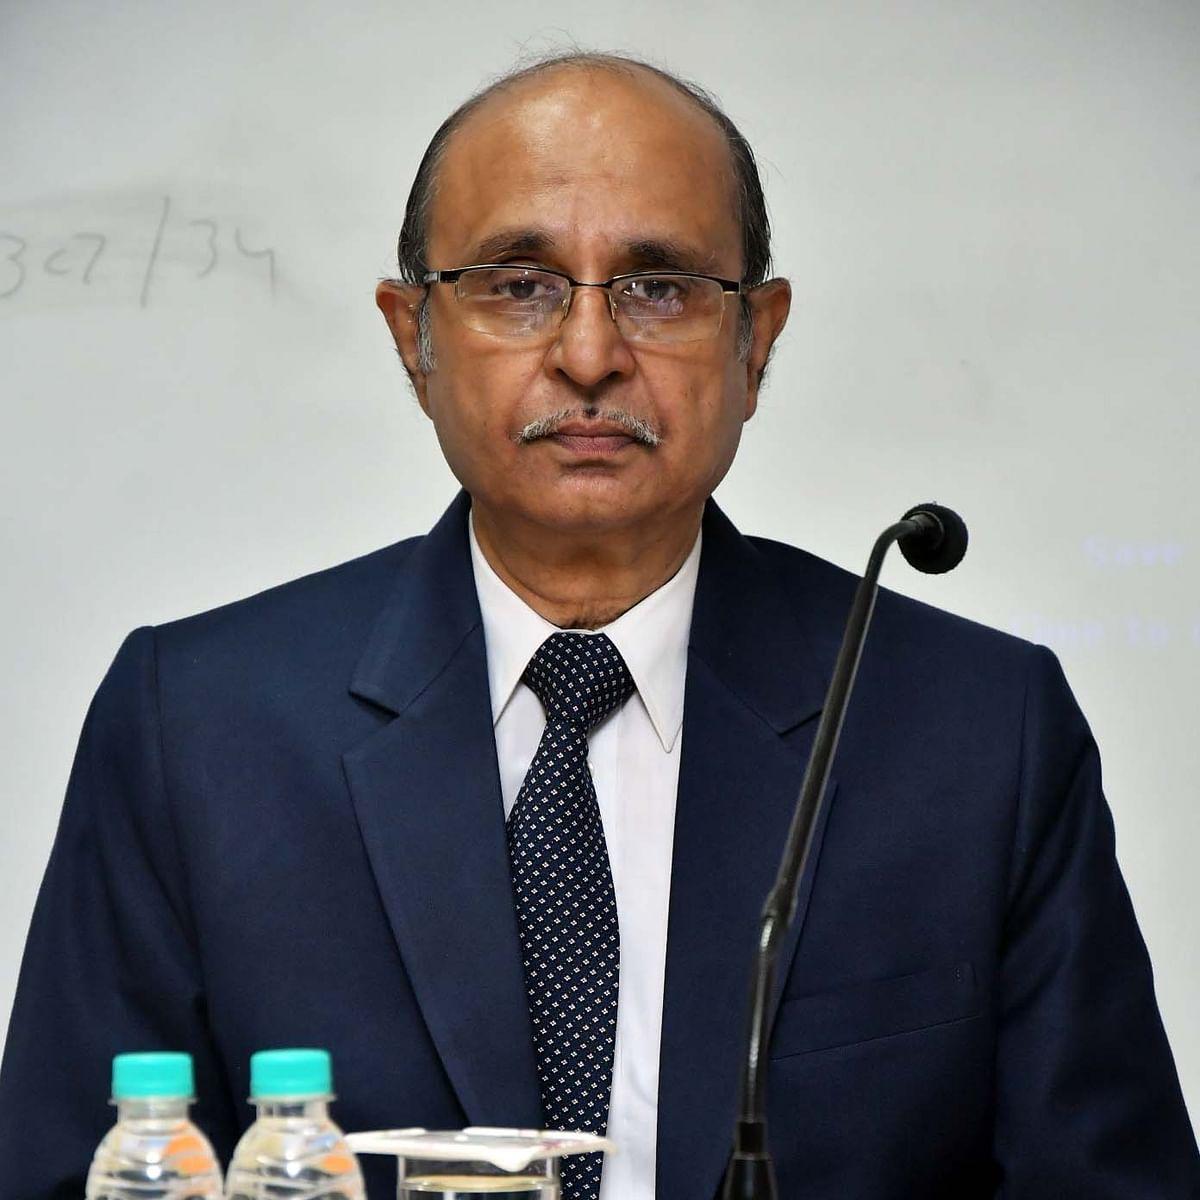 Bhopal: Workshop on cross examination held